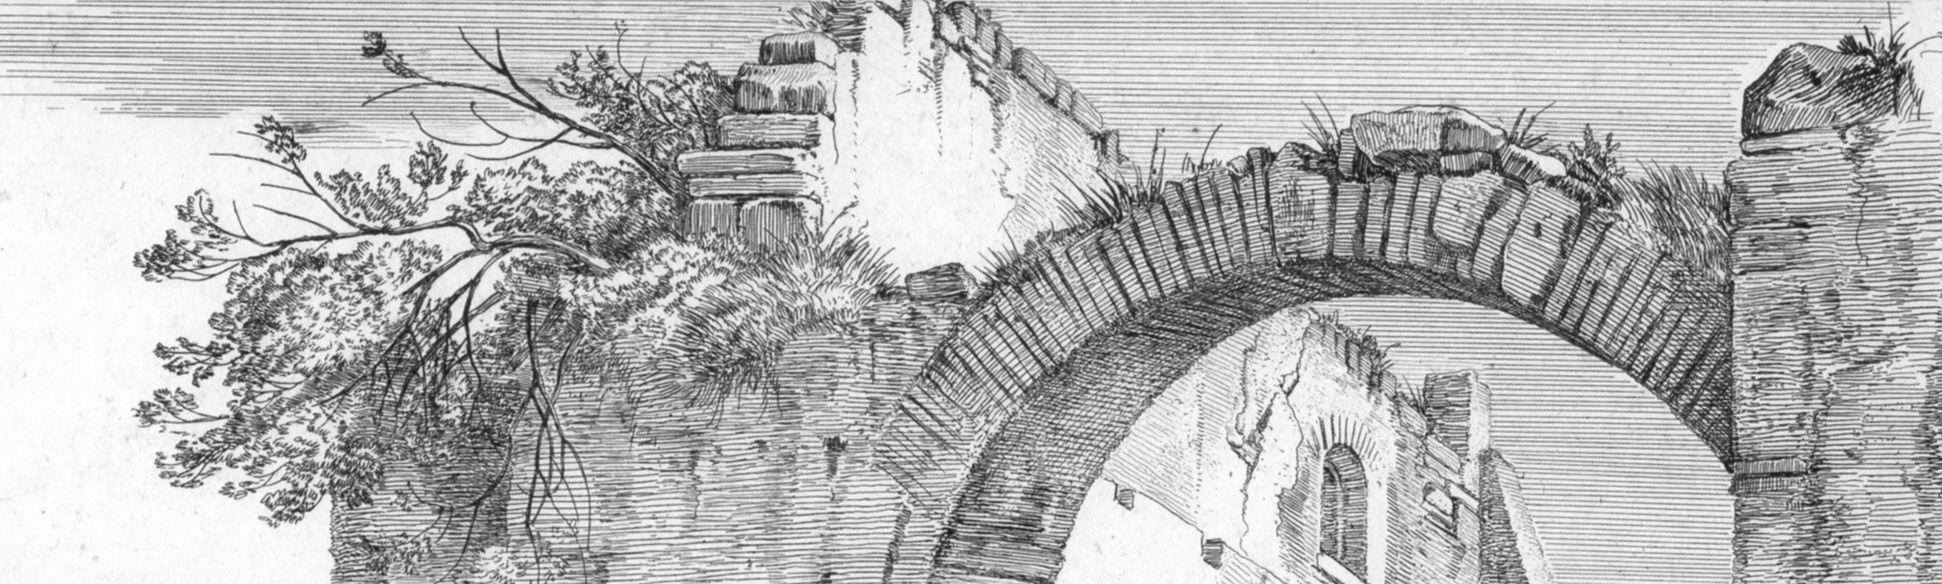 Rindvieh bei Ruinen Ruine, Detail